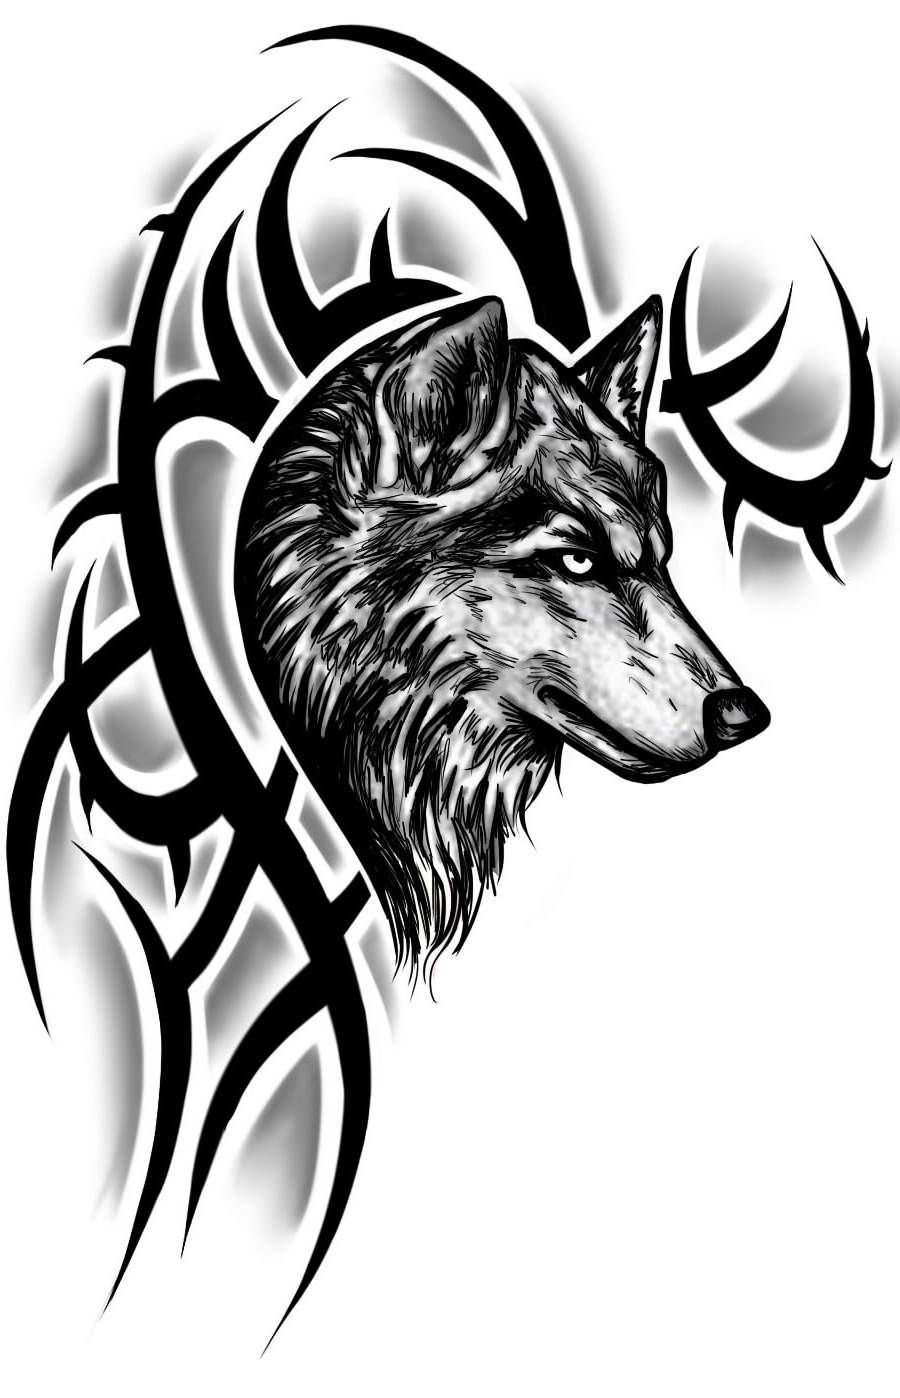 5d8fd5120 Realistic Wolf Head With Tribal Design Tattoo Sample | Tattoos ...